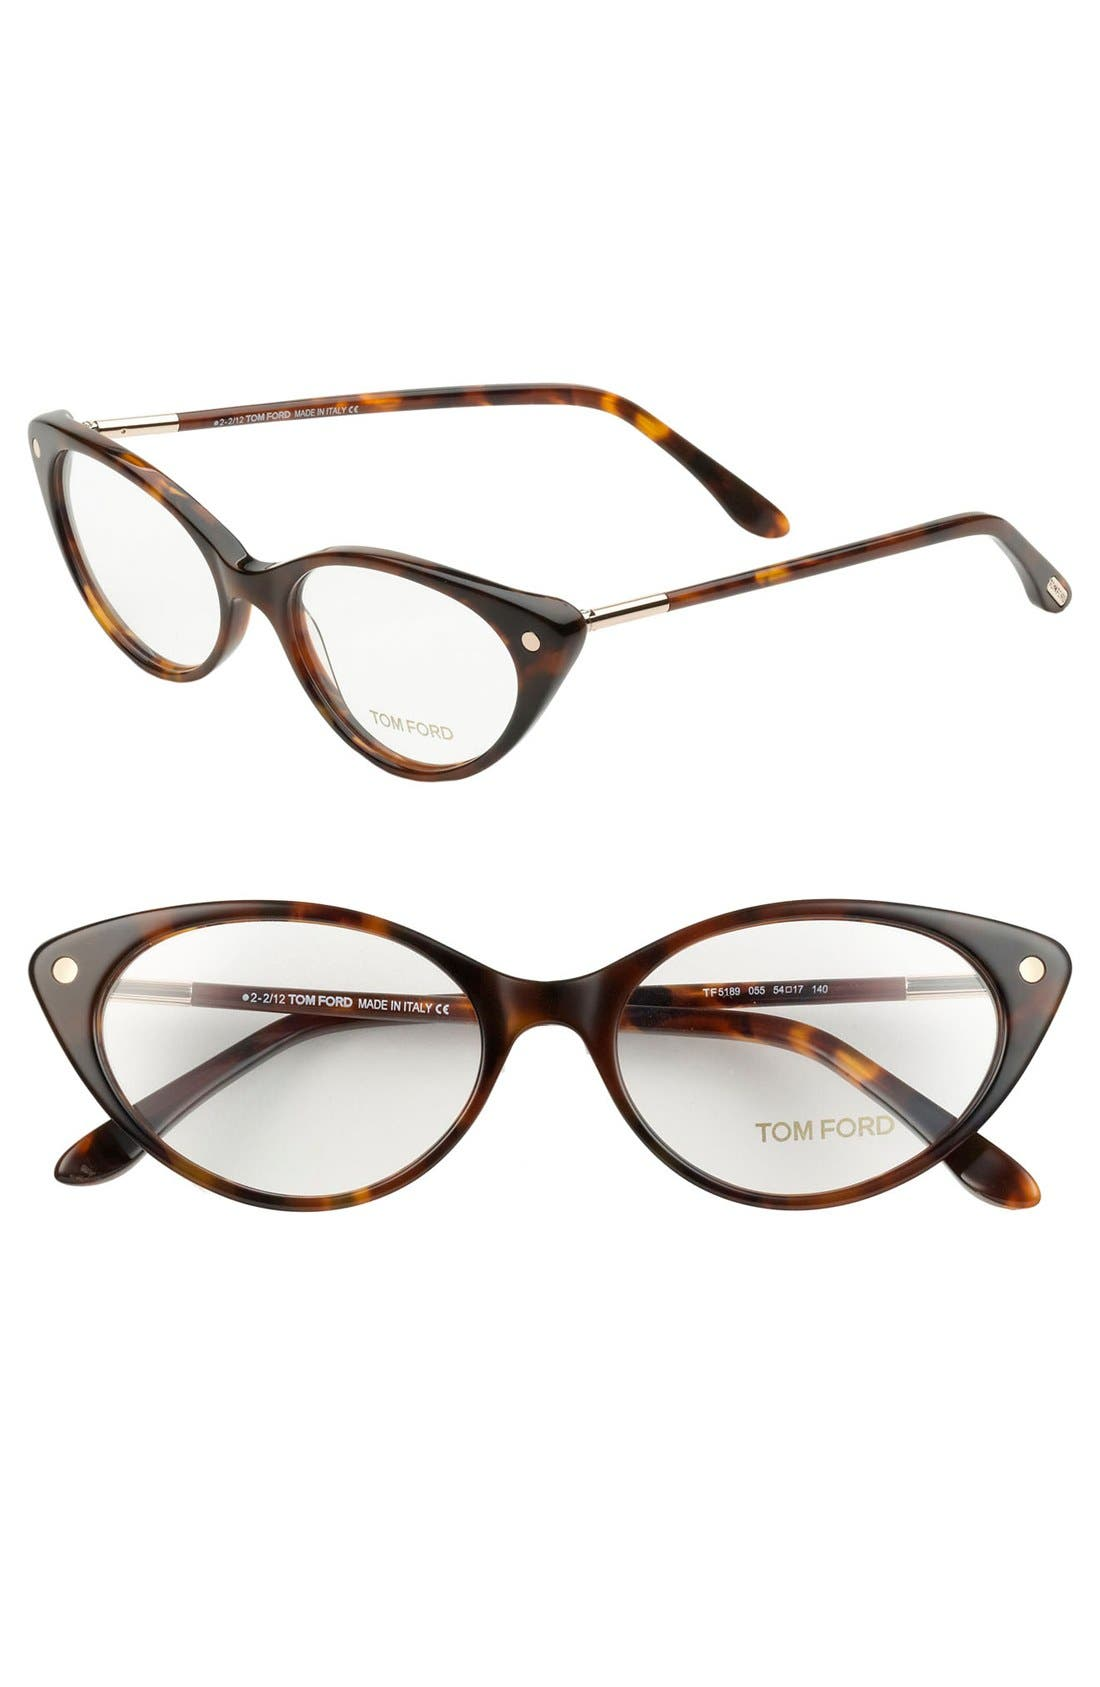 Alternate Image 1 Selected - Tom Ford 54mm Optical Glasses (Online Only)